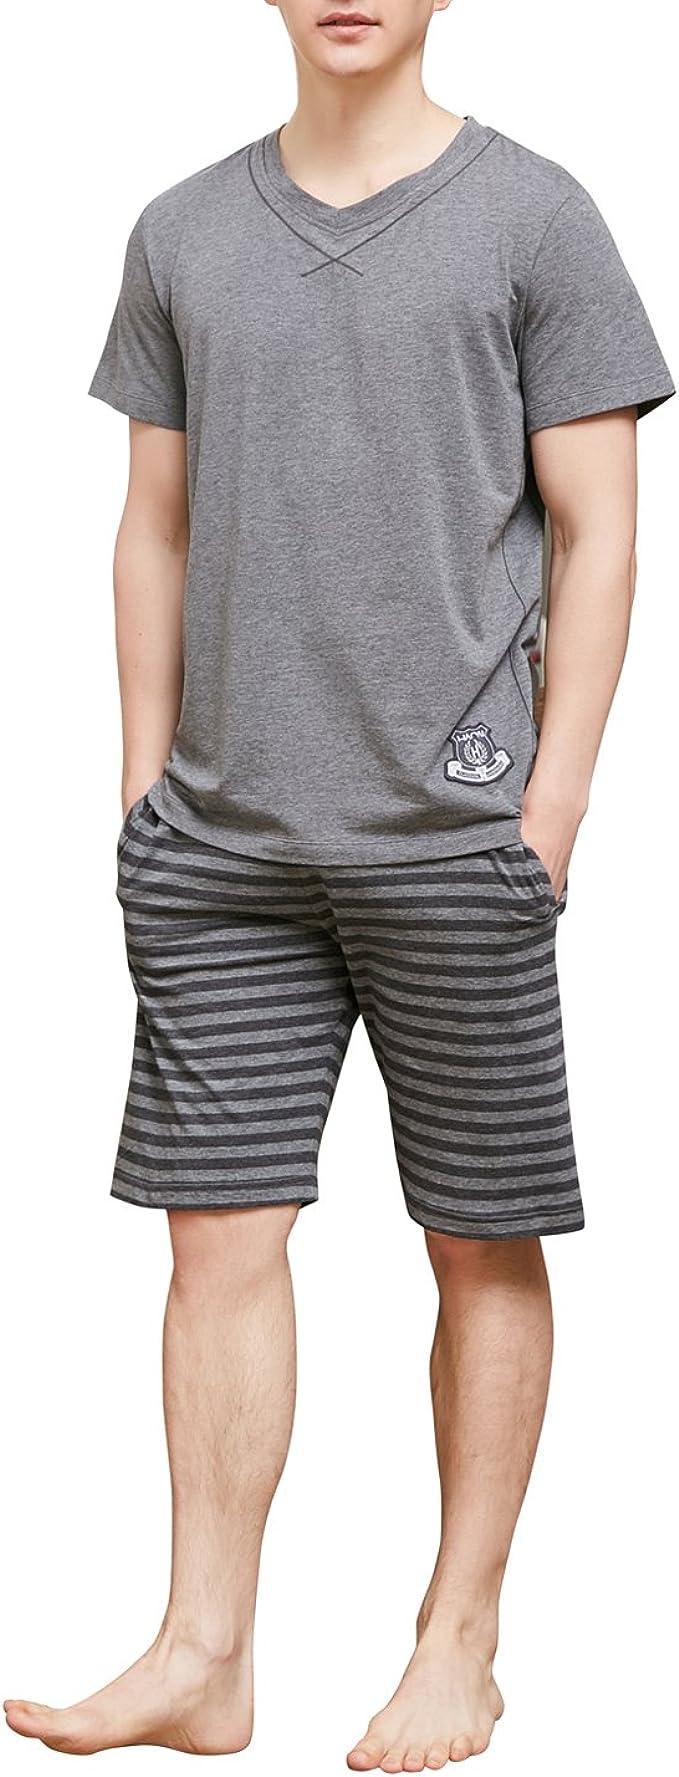 Summer Men Pajamas Set Cotton Soft Comfortable  Short Sleeve Sleepwear Print